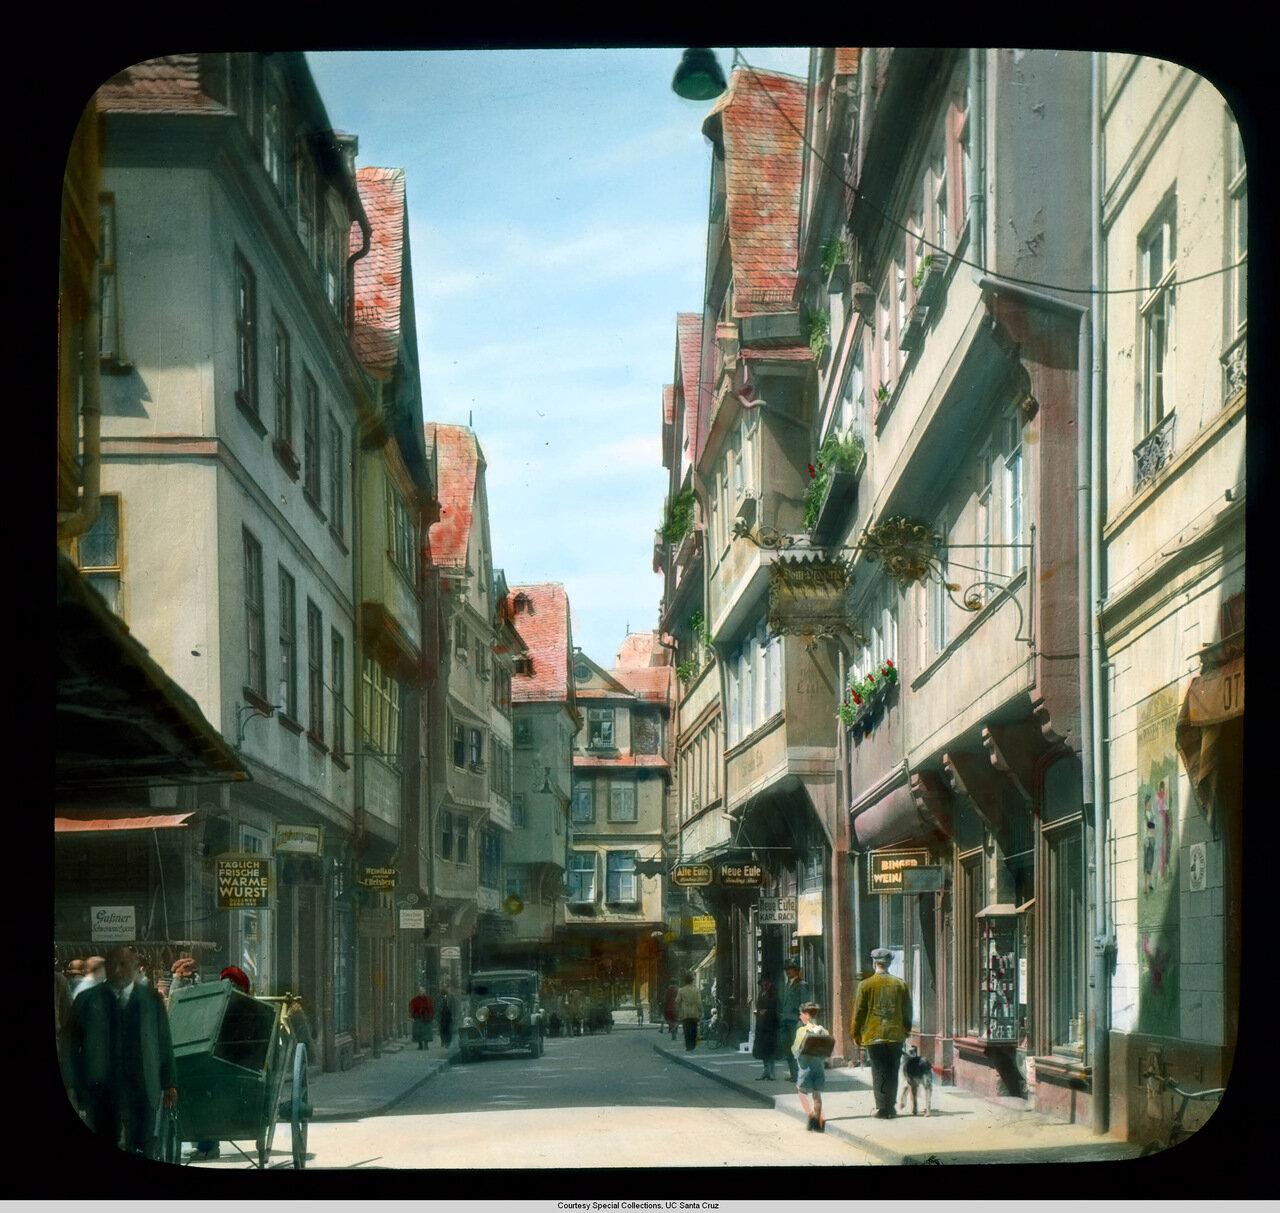 Франкфурт-на-Майне. Магазины на площади Рёмерберг